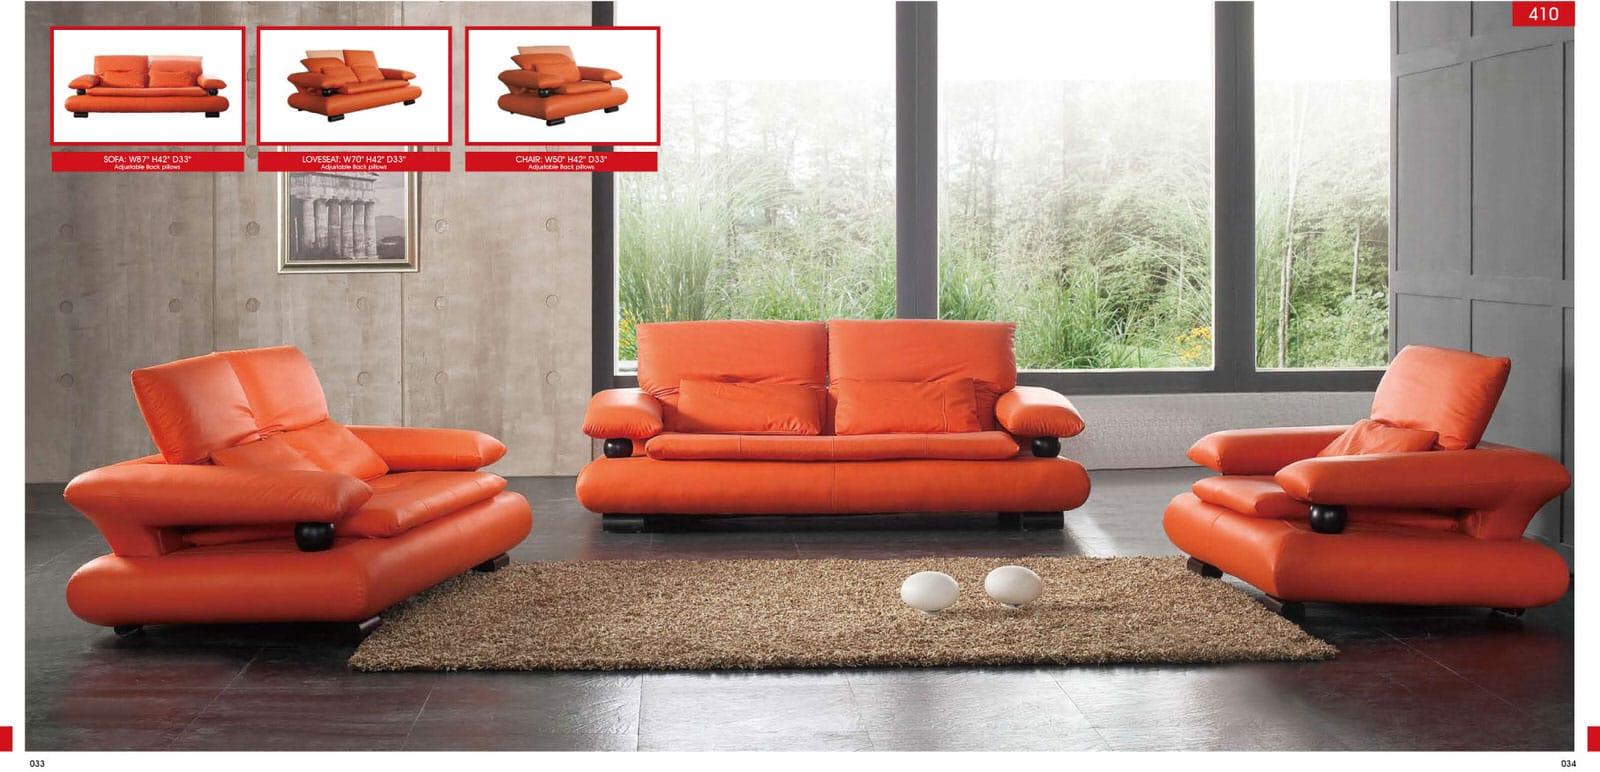 410 orange leather sofa